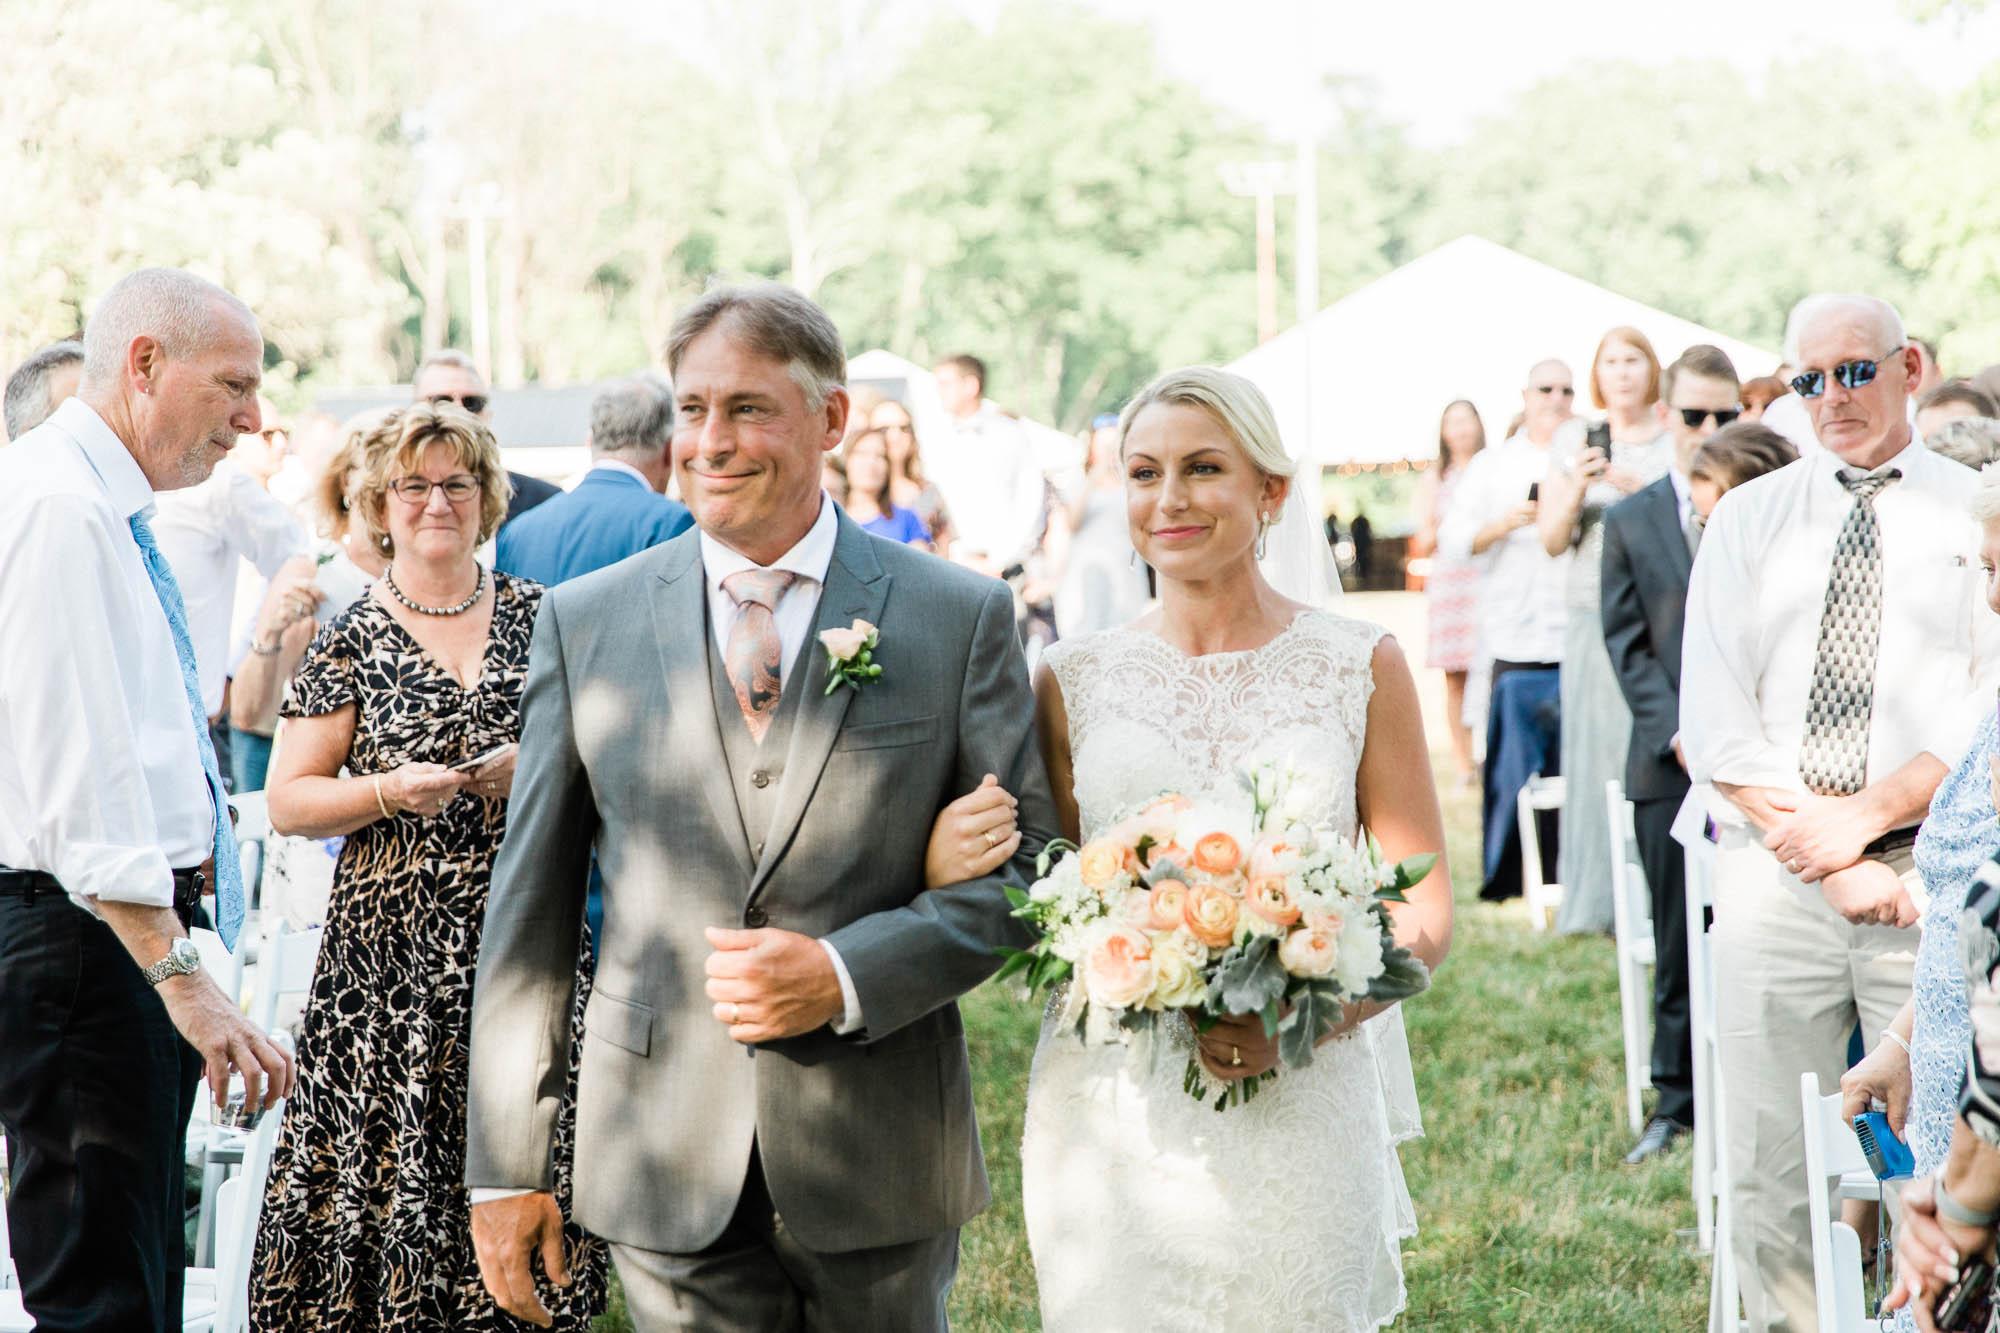 Allenberry-resort-historic-pennsylvania-wedding-19901.jpg